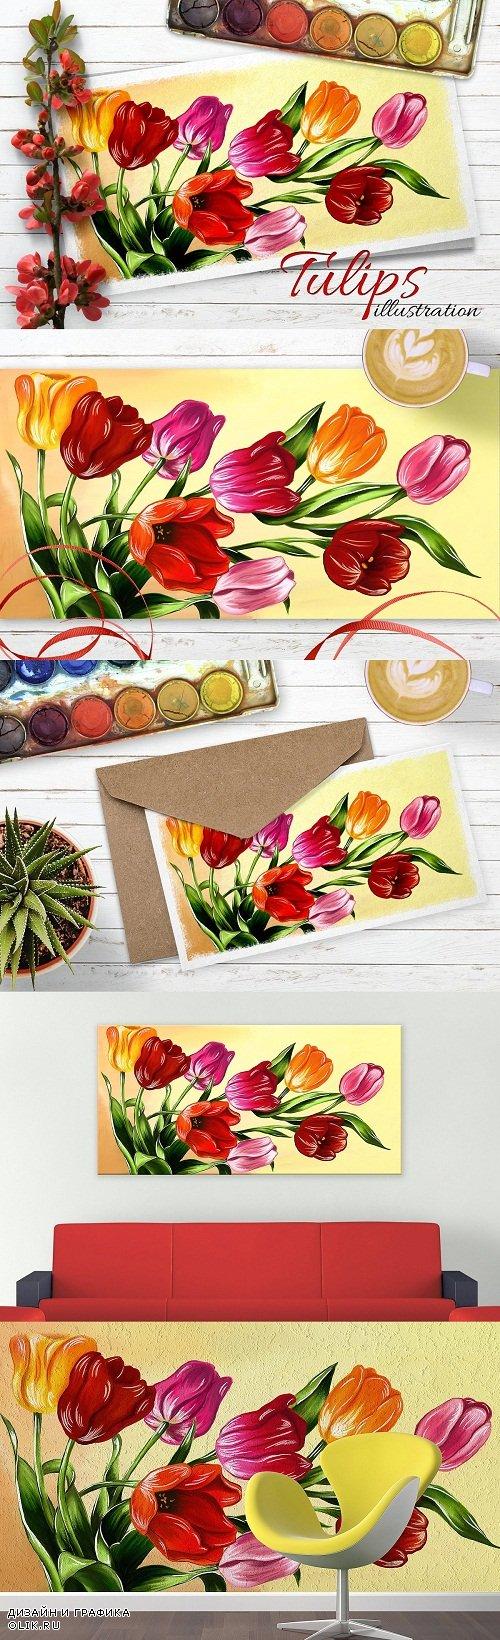 Tulips digital painting - 2488766